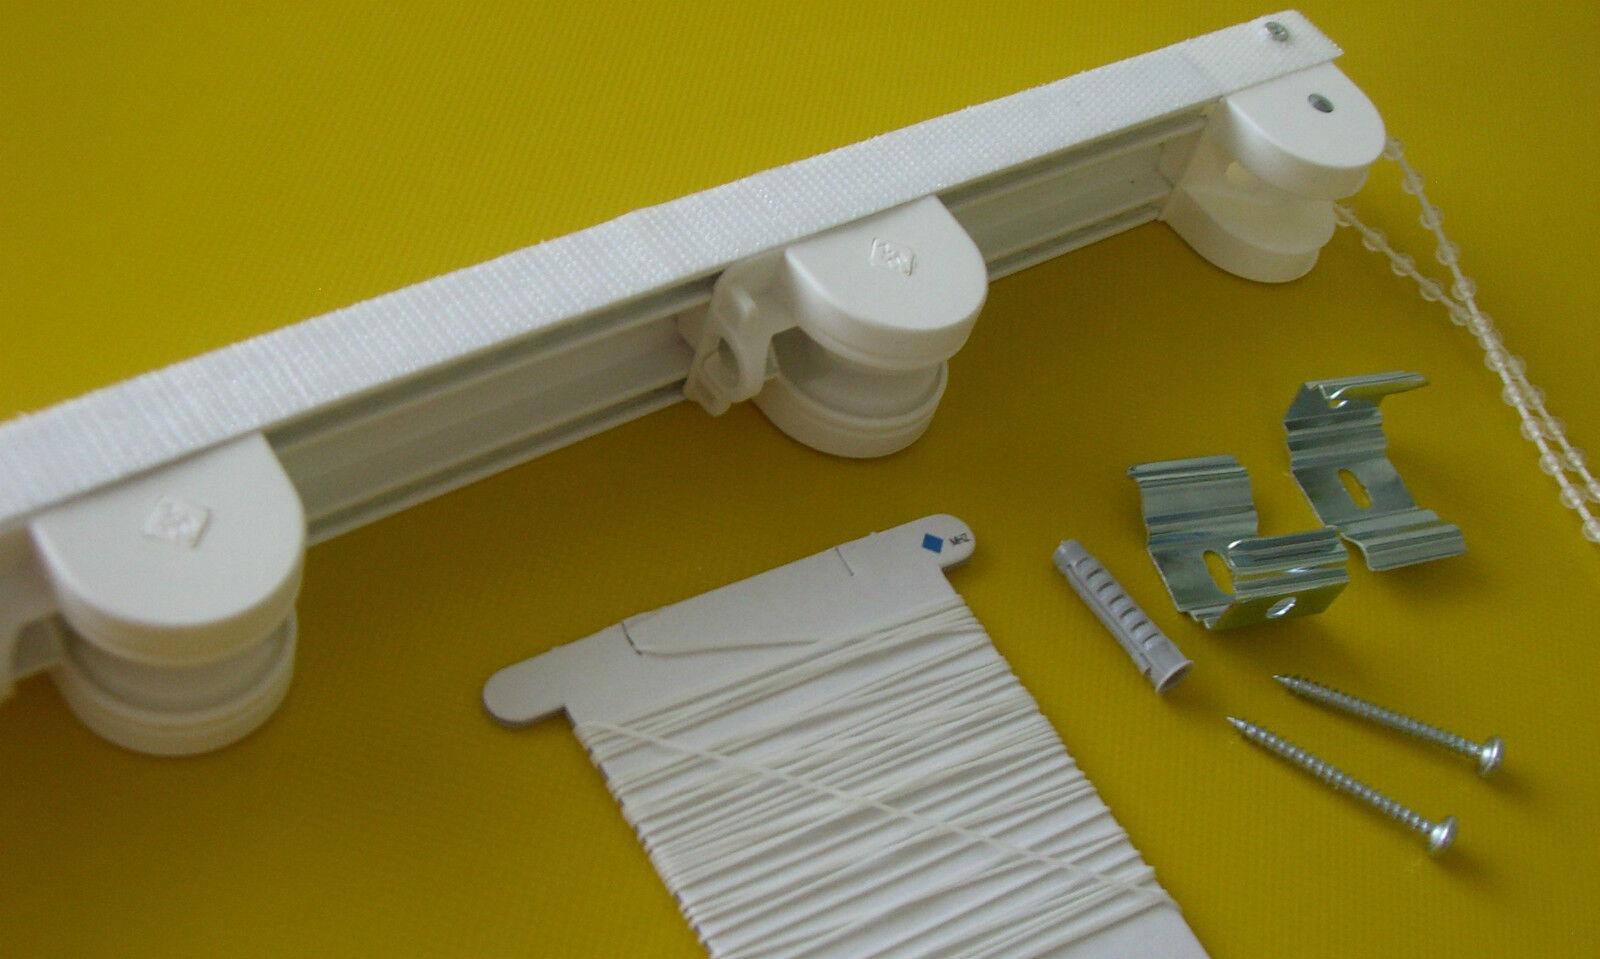 Raffrollotechnik Ambiente Raffrollo Gardinen Vorhang Faltrollo MHZ Hachtel  | Online Outlet Shop